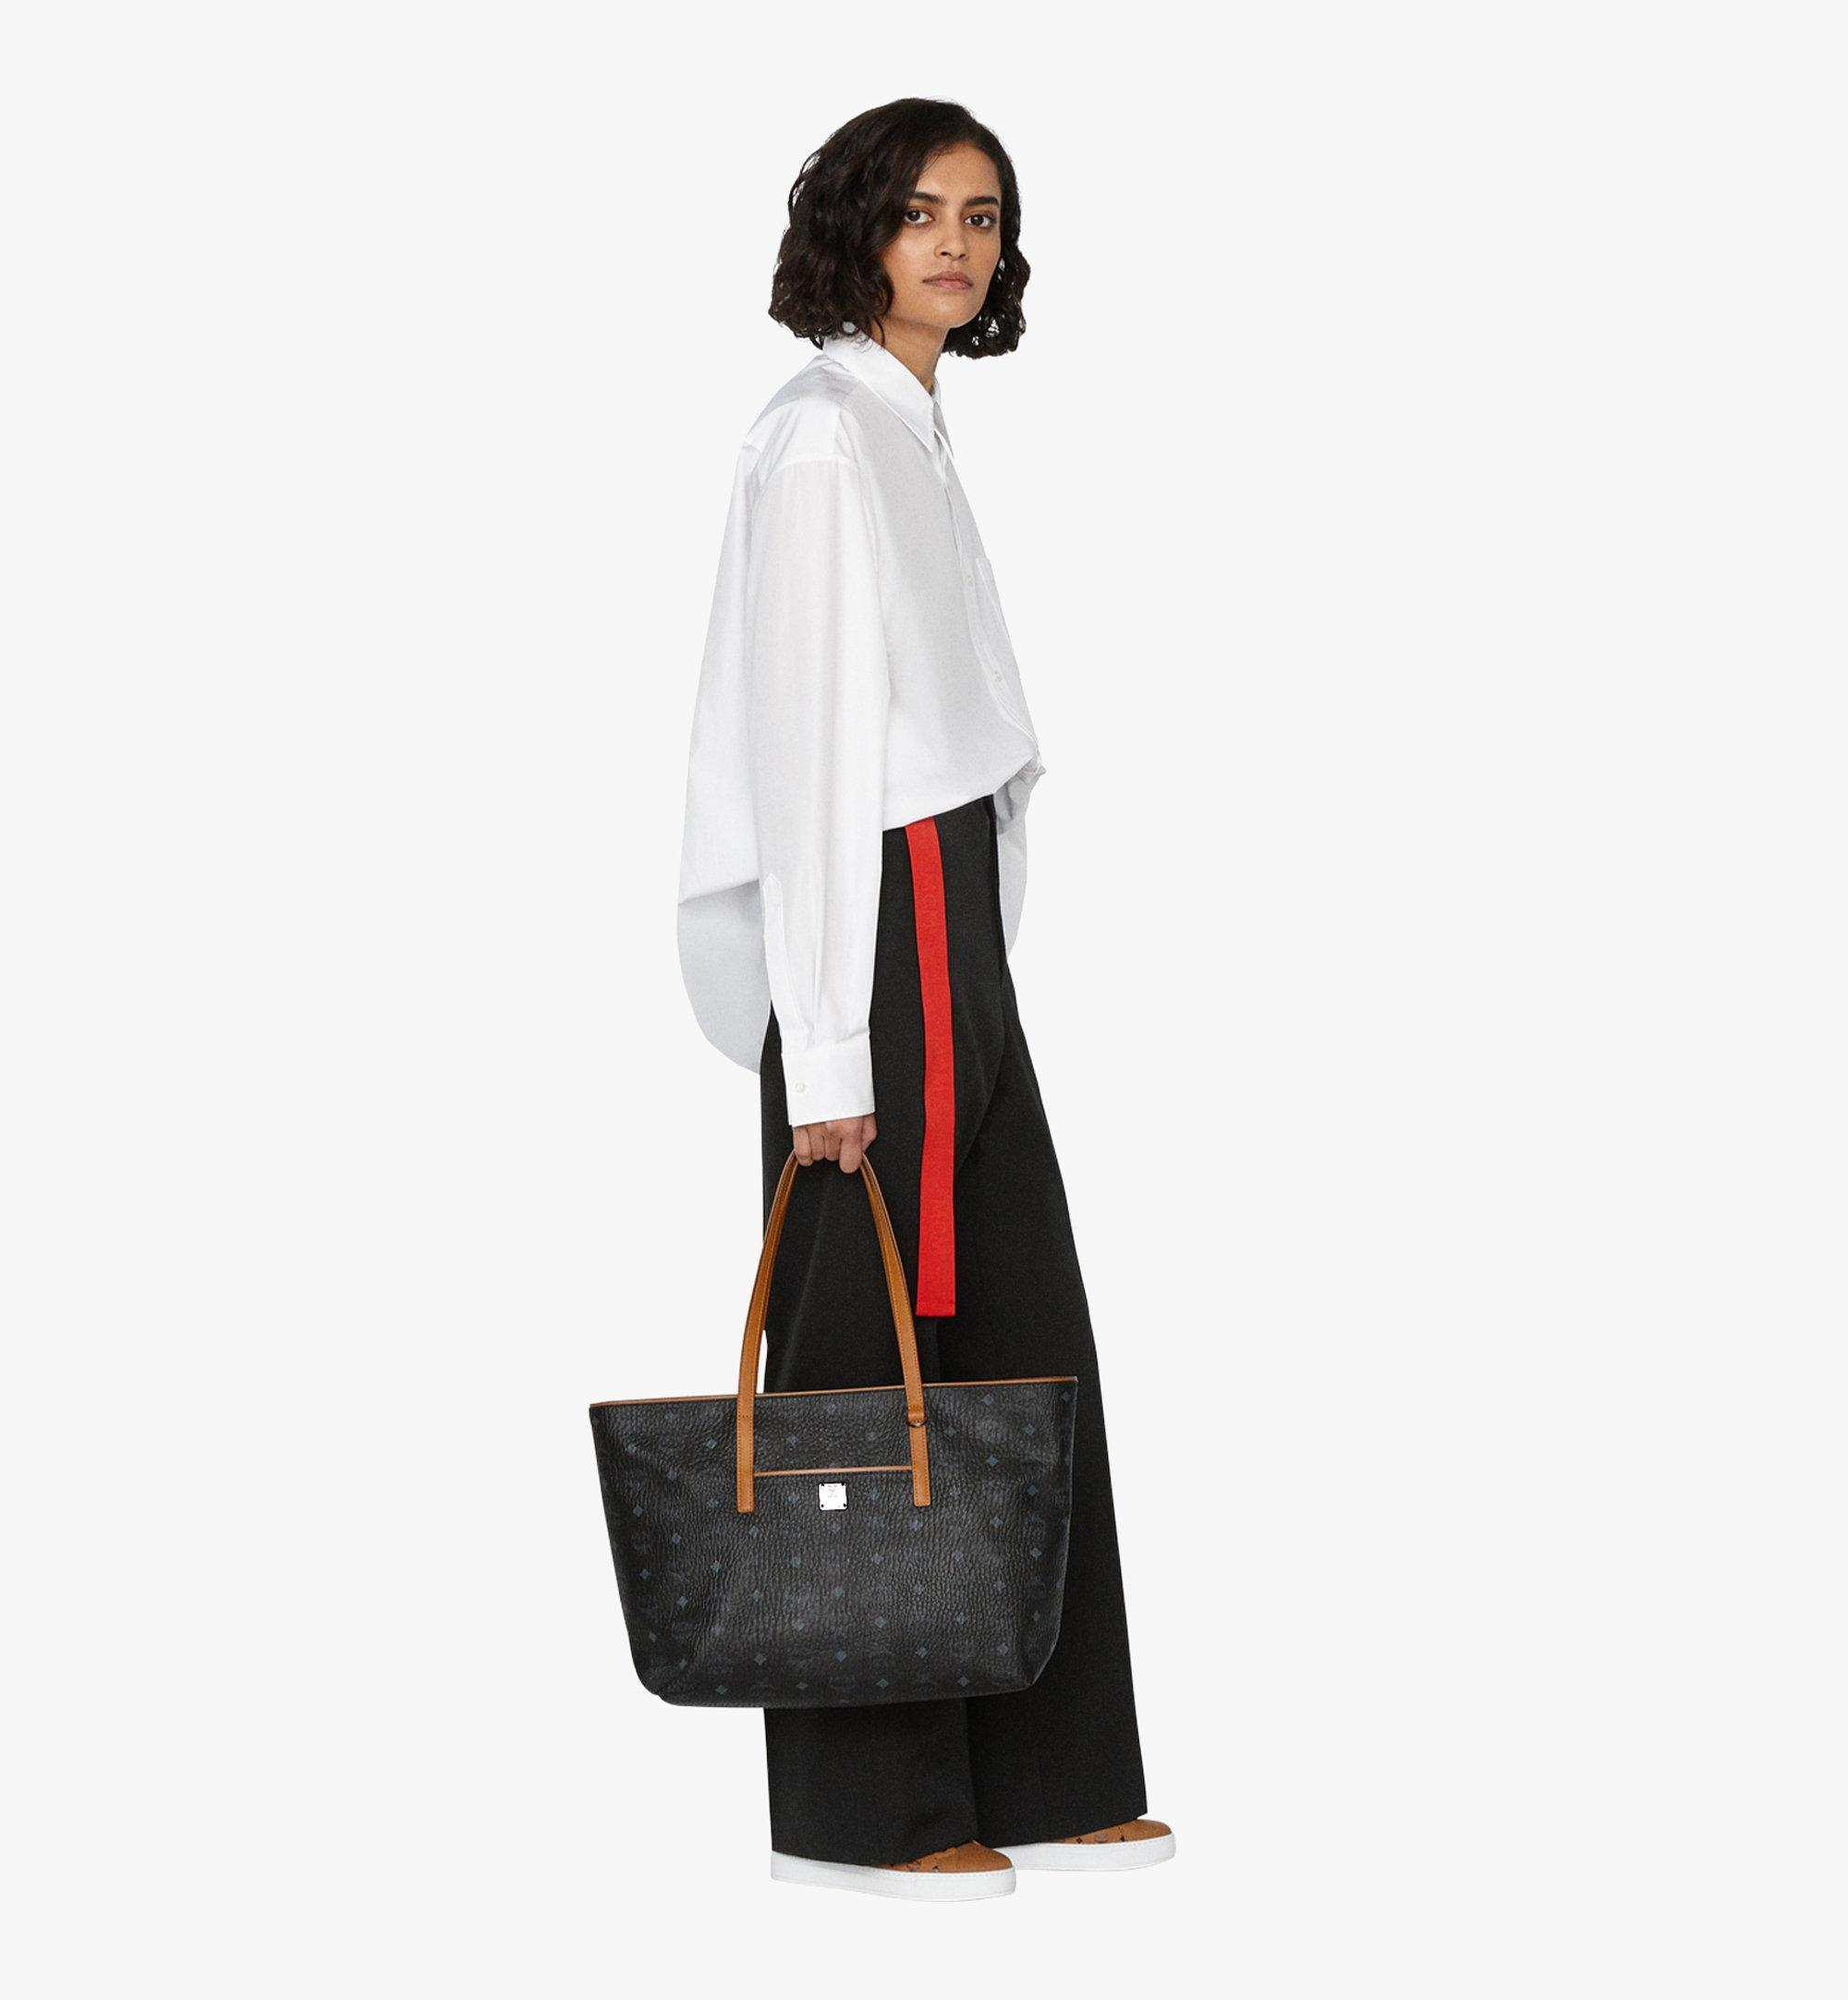 MCM Anya Shopper in Visetos Black MWP9AVI61BK001 Alternate View 2